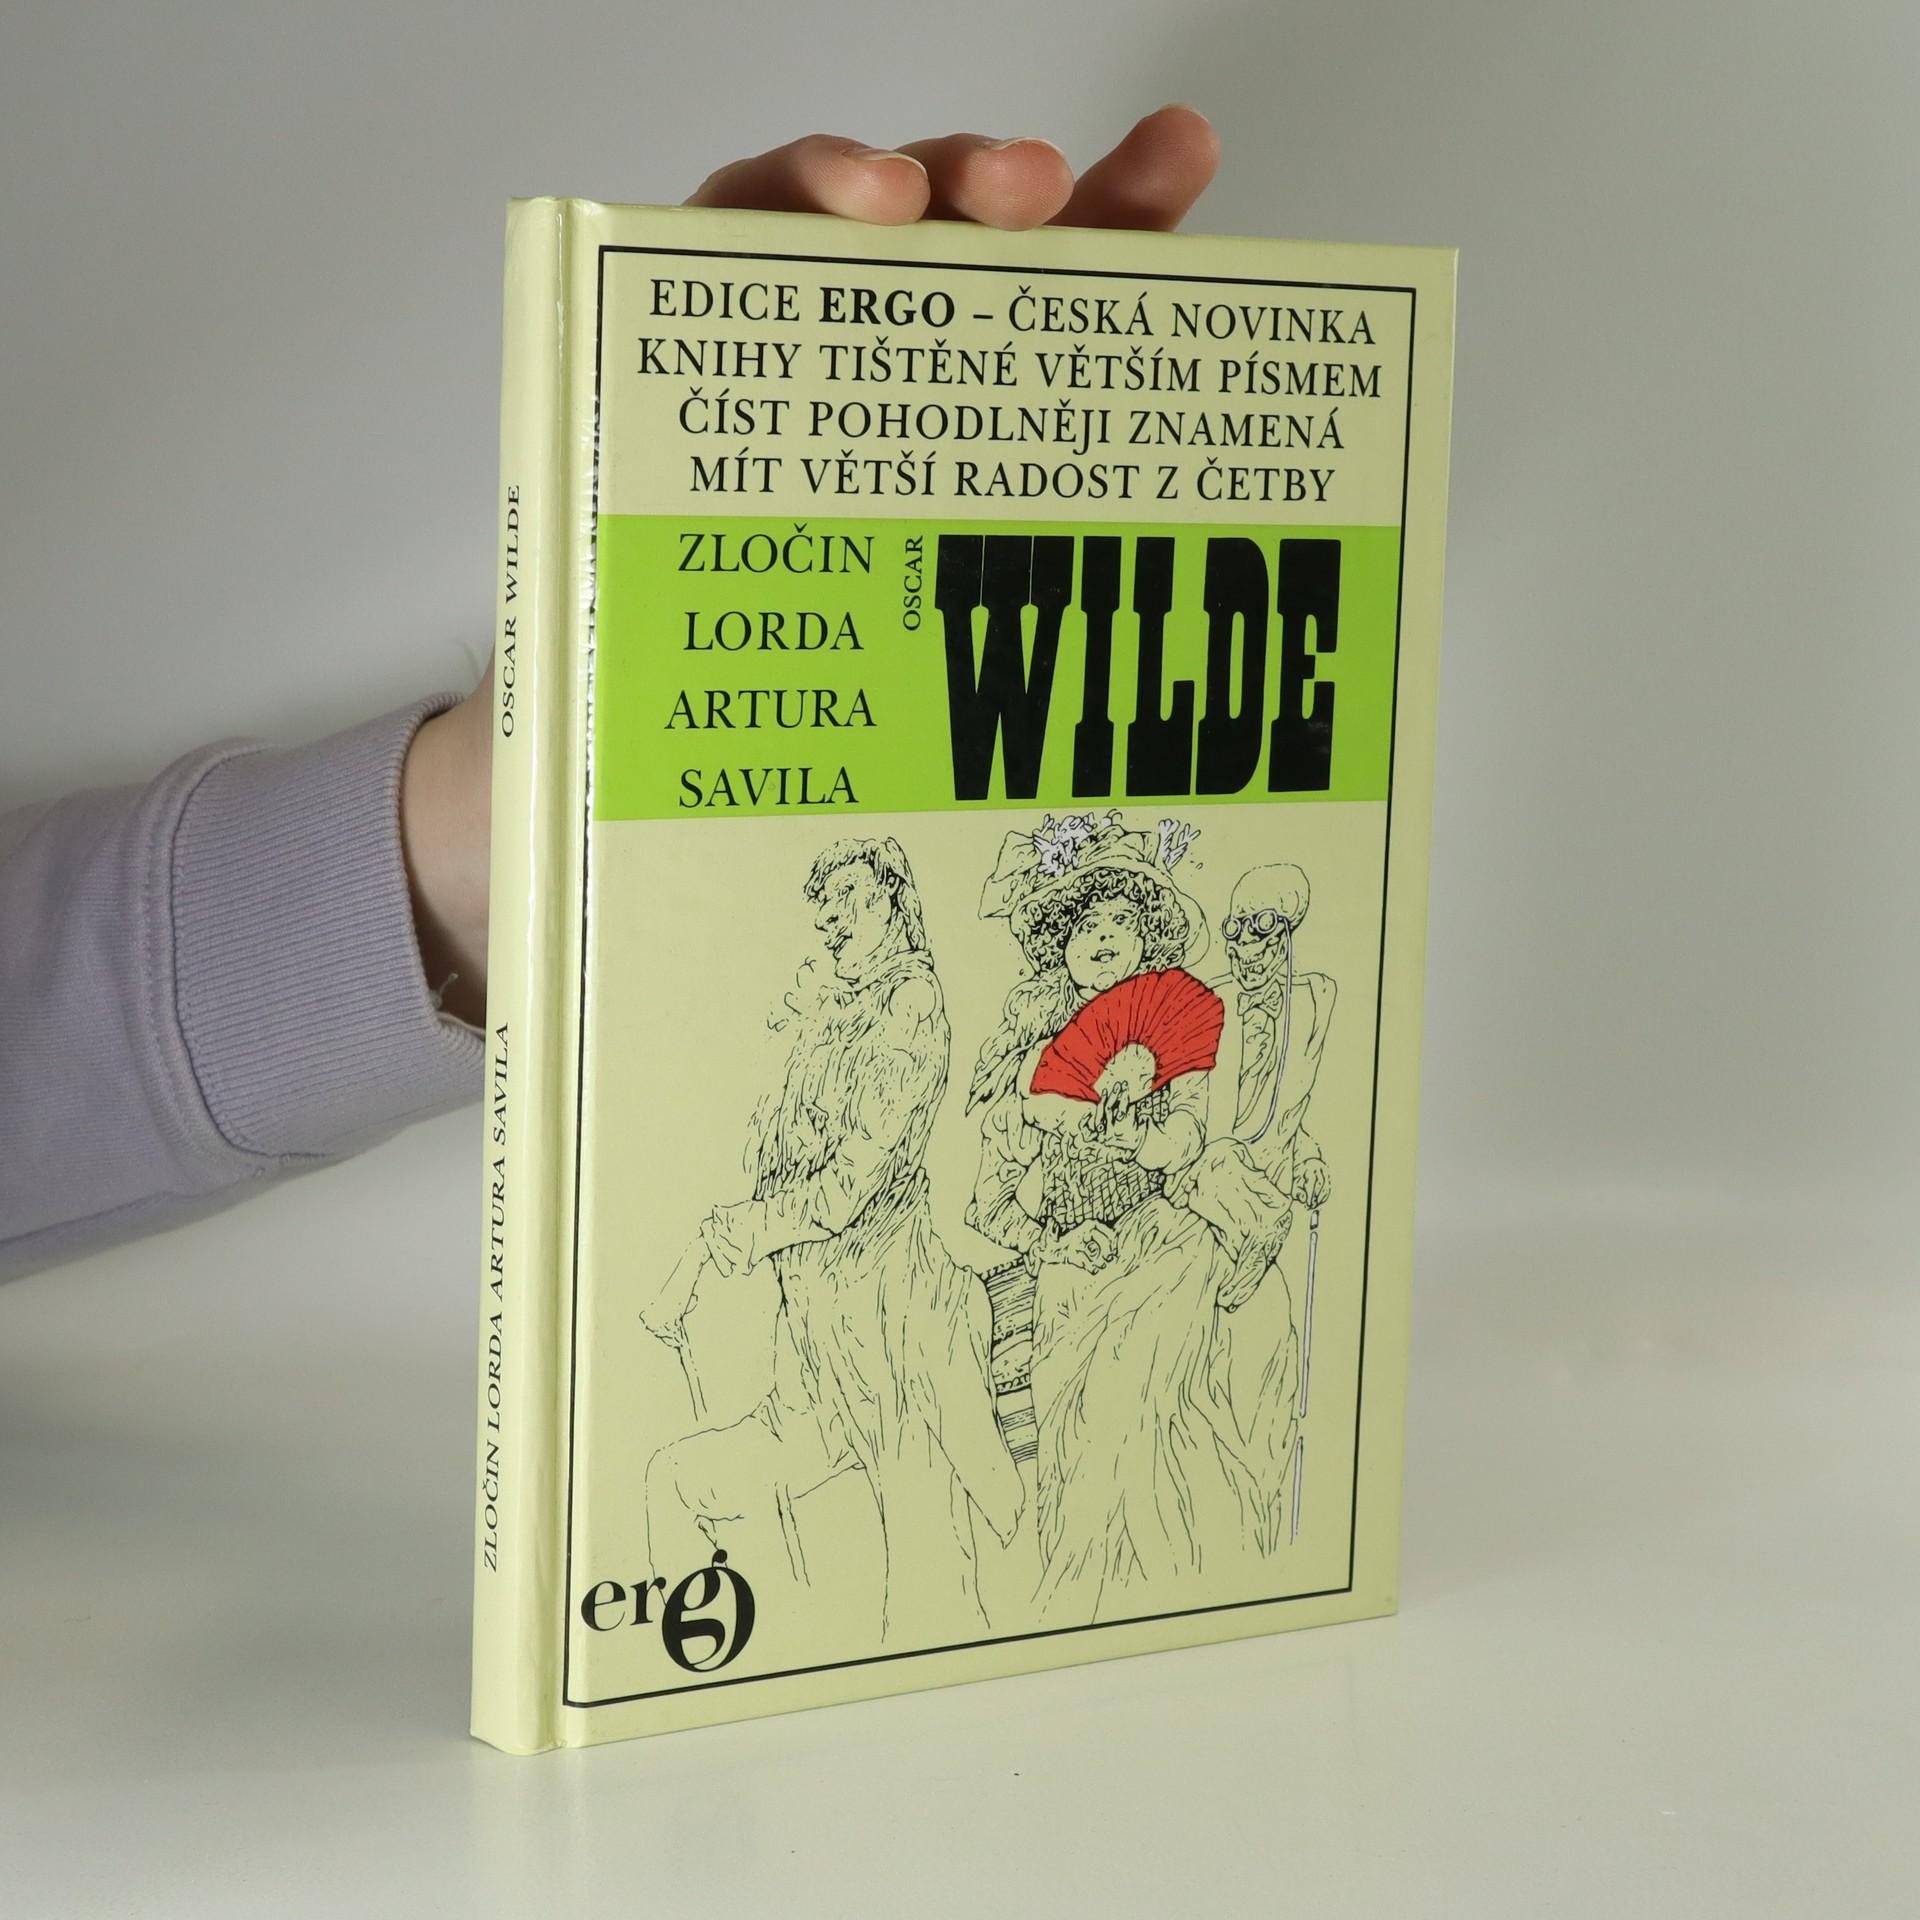 antikvární kniha Zločin lorda Artura Savila, 1992